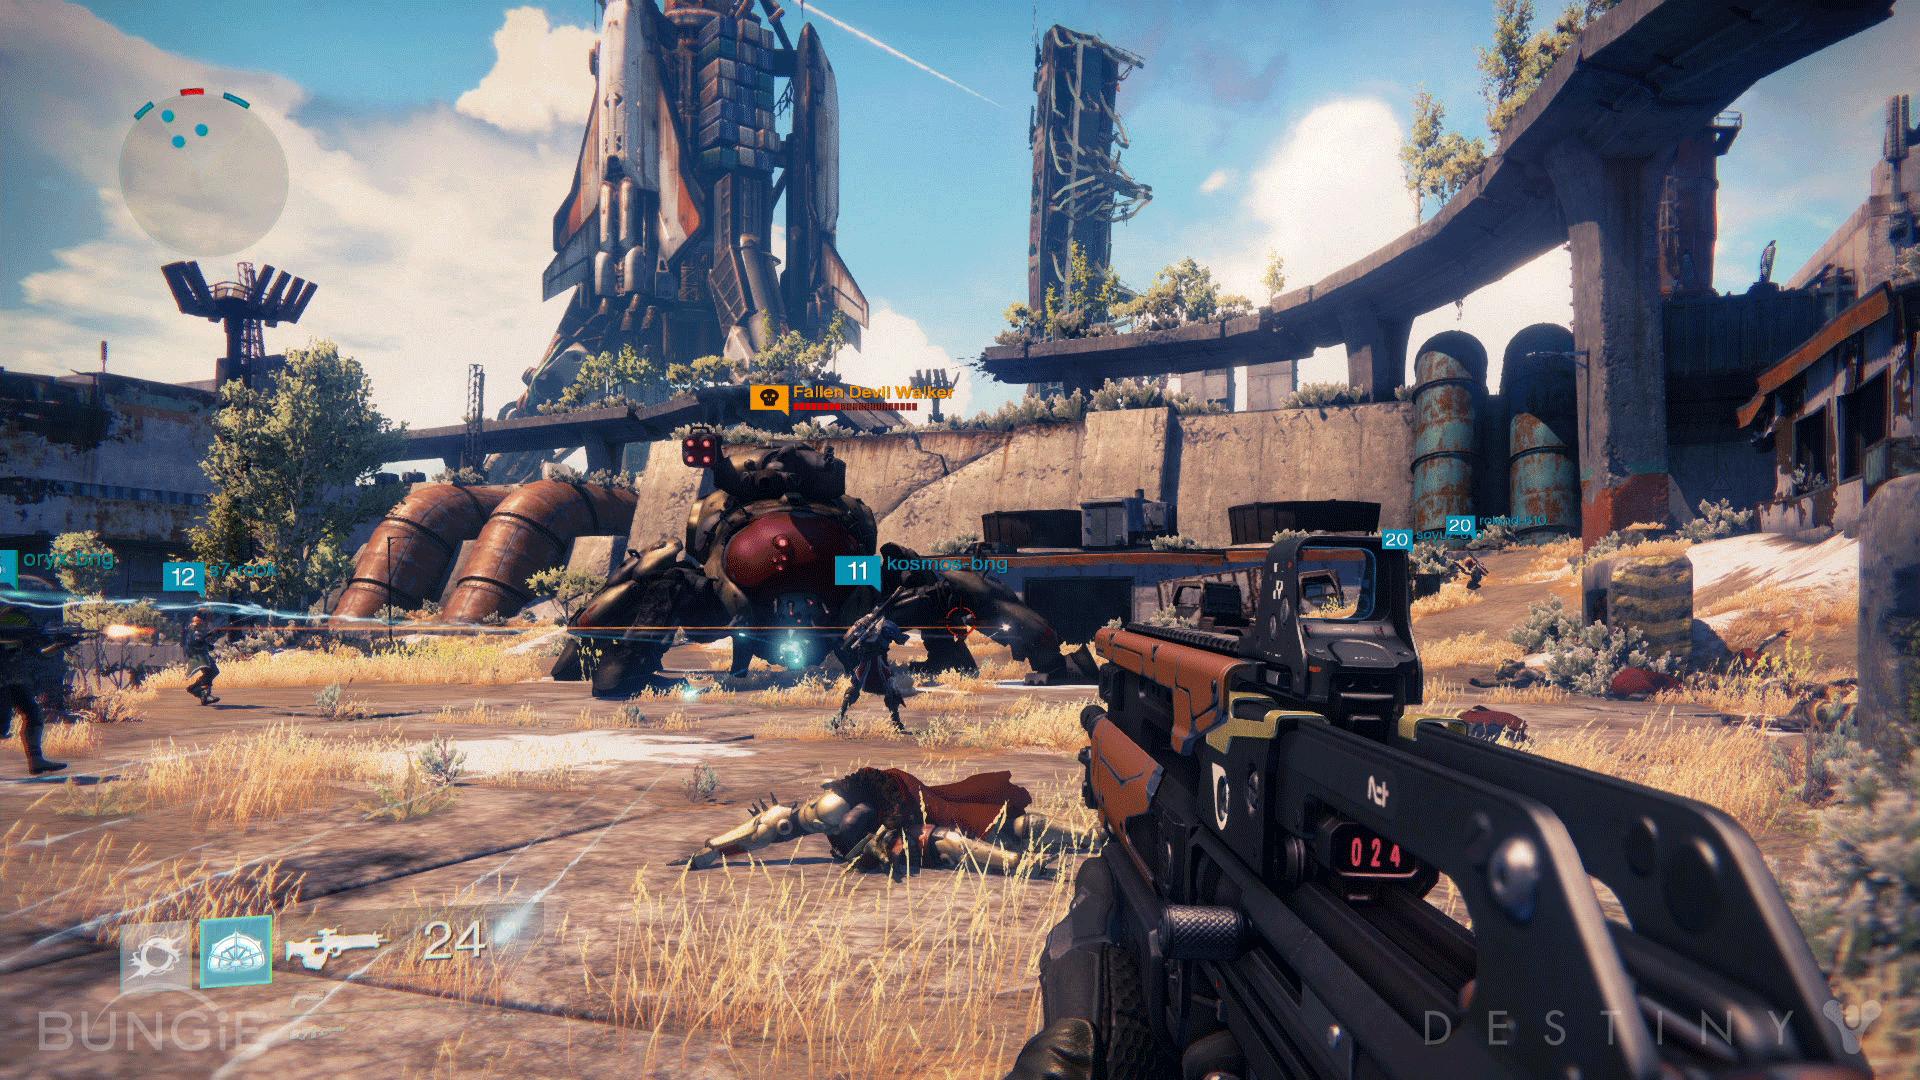 destiny-bungies-mmo-shooter-im-test-wallpaper-nat-games-2